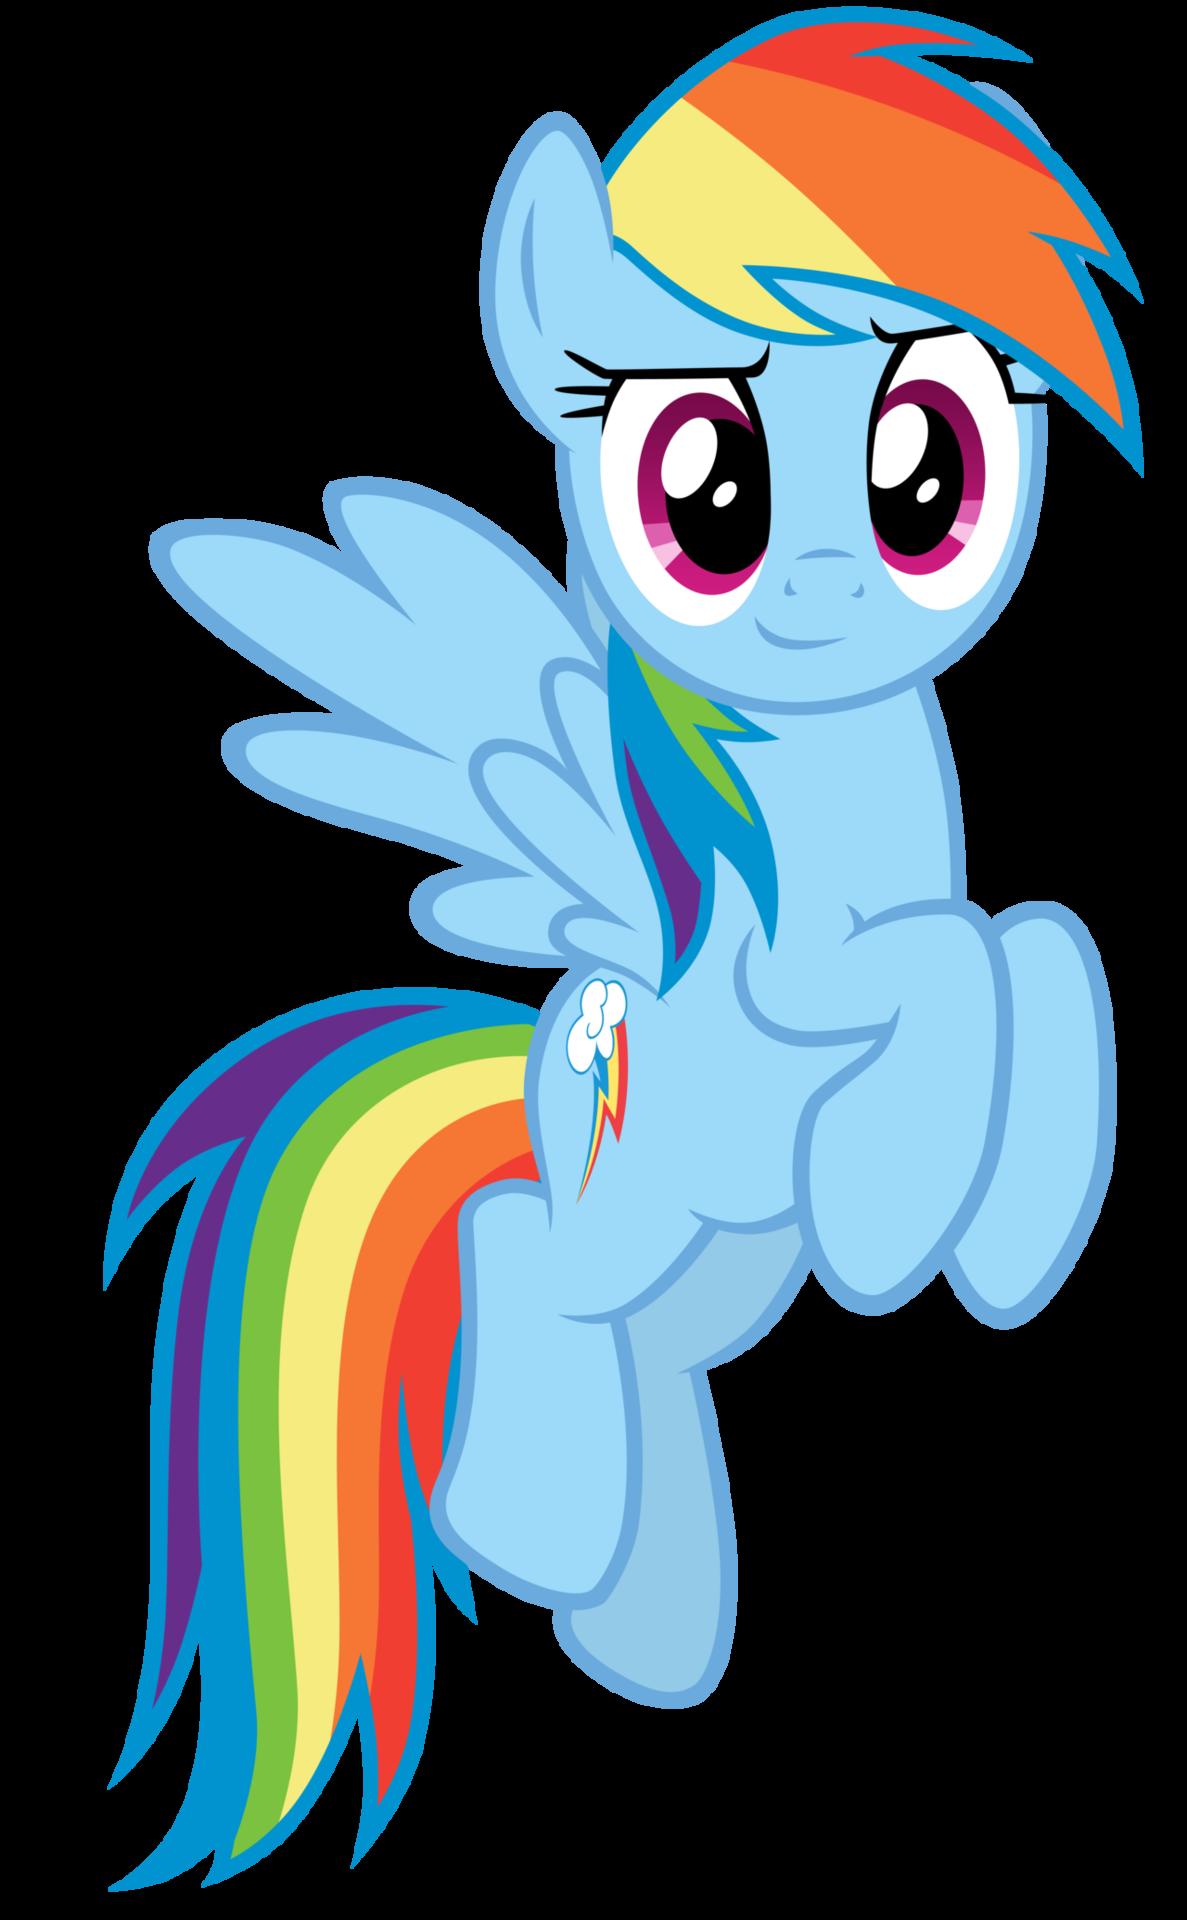 Image - FANMADE Rainbow Dash Rainbow Dash Mlp Vector